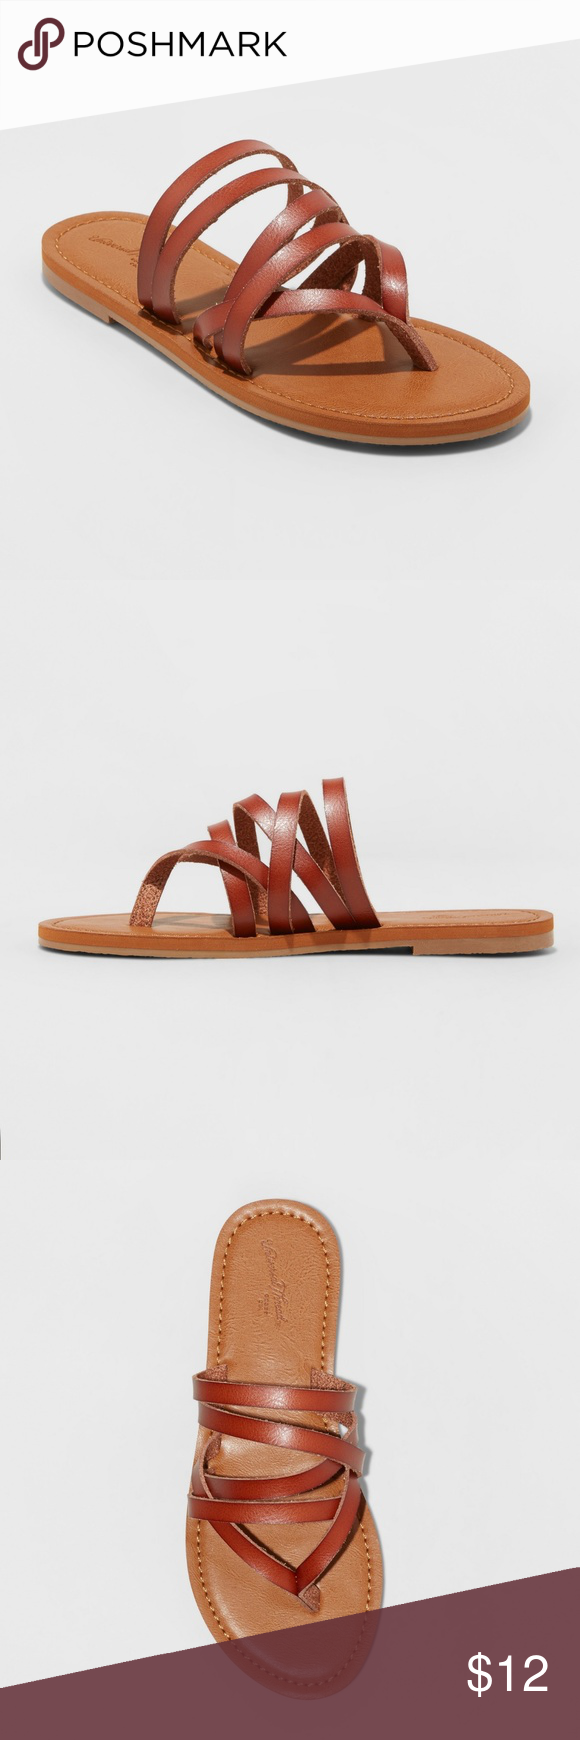 17022bbd7251 NWT Maritza Multi Strap Toe Slide Sandal- Cognac NWT Maritza Multi Strap  Toe Slide Sandal- Cognac Universal Thread Shoes Sandals